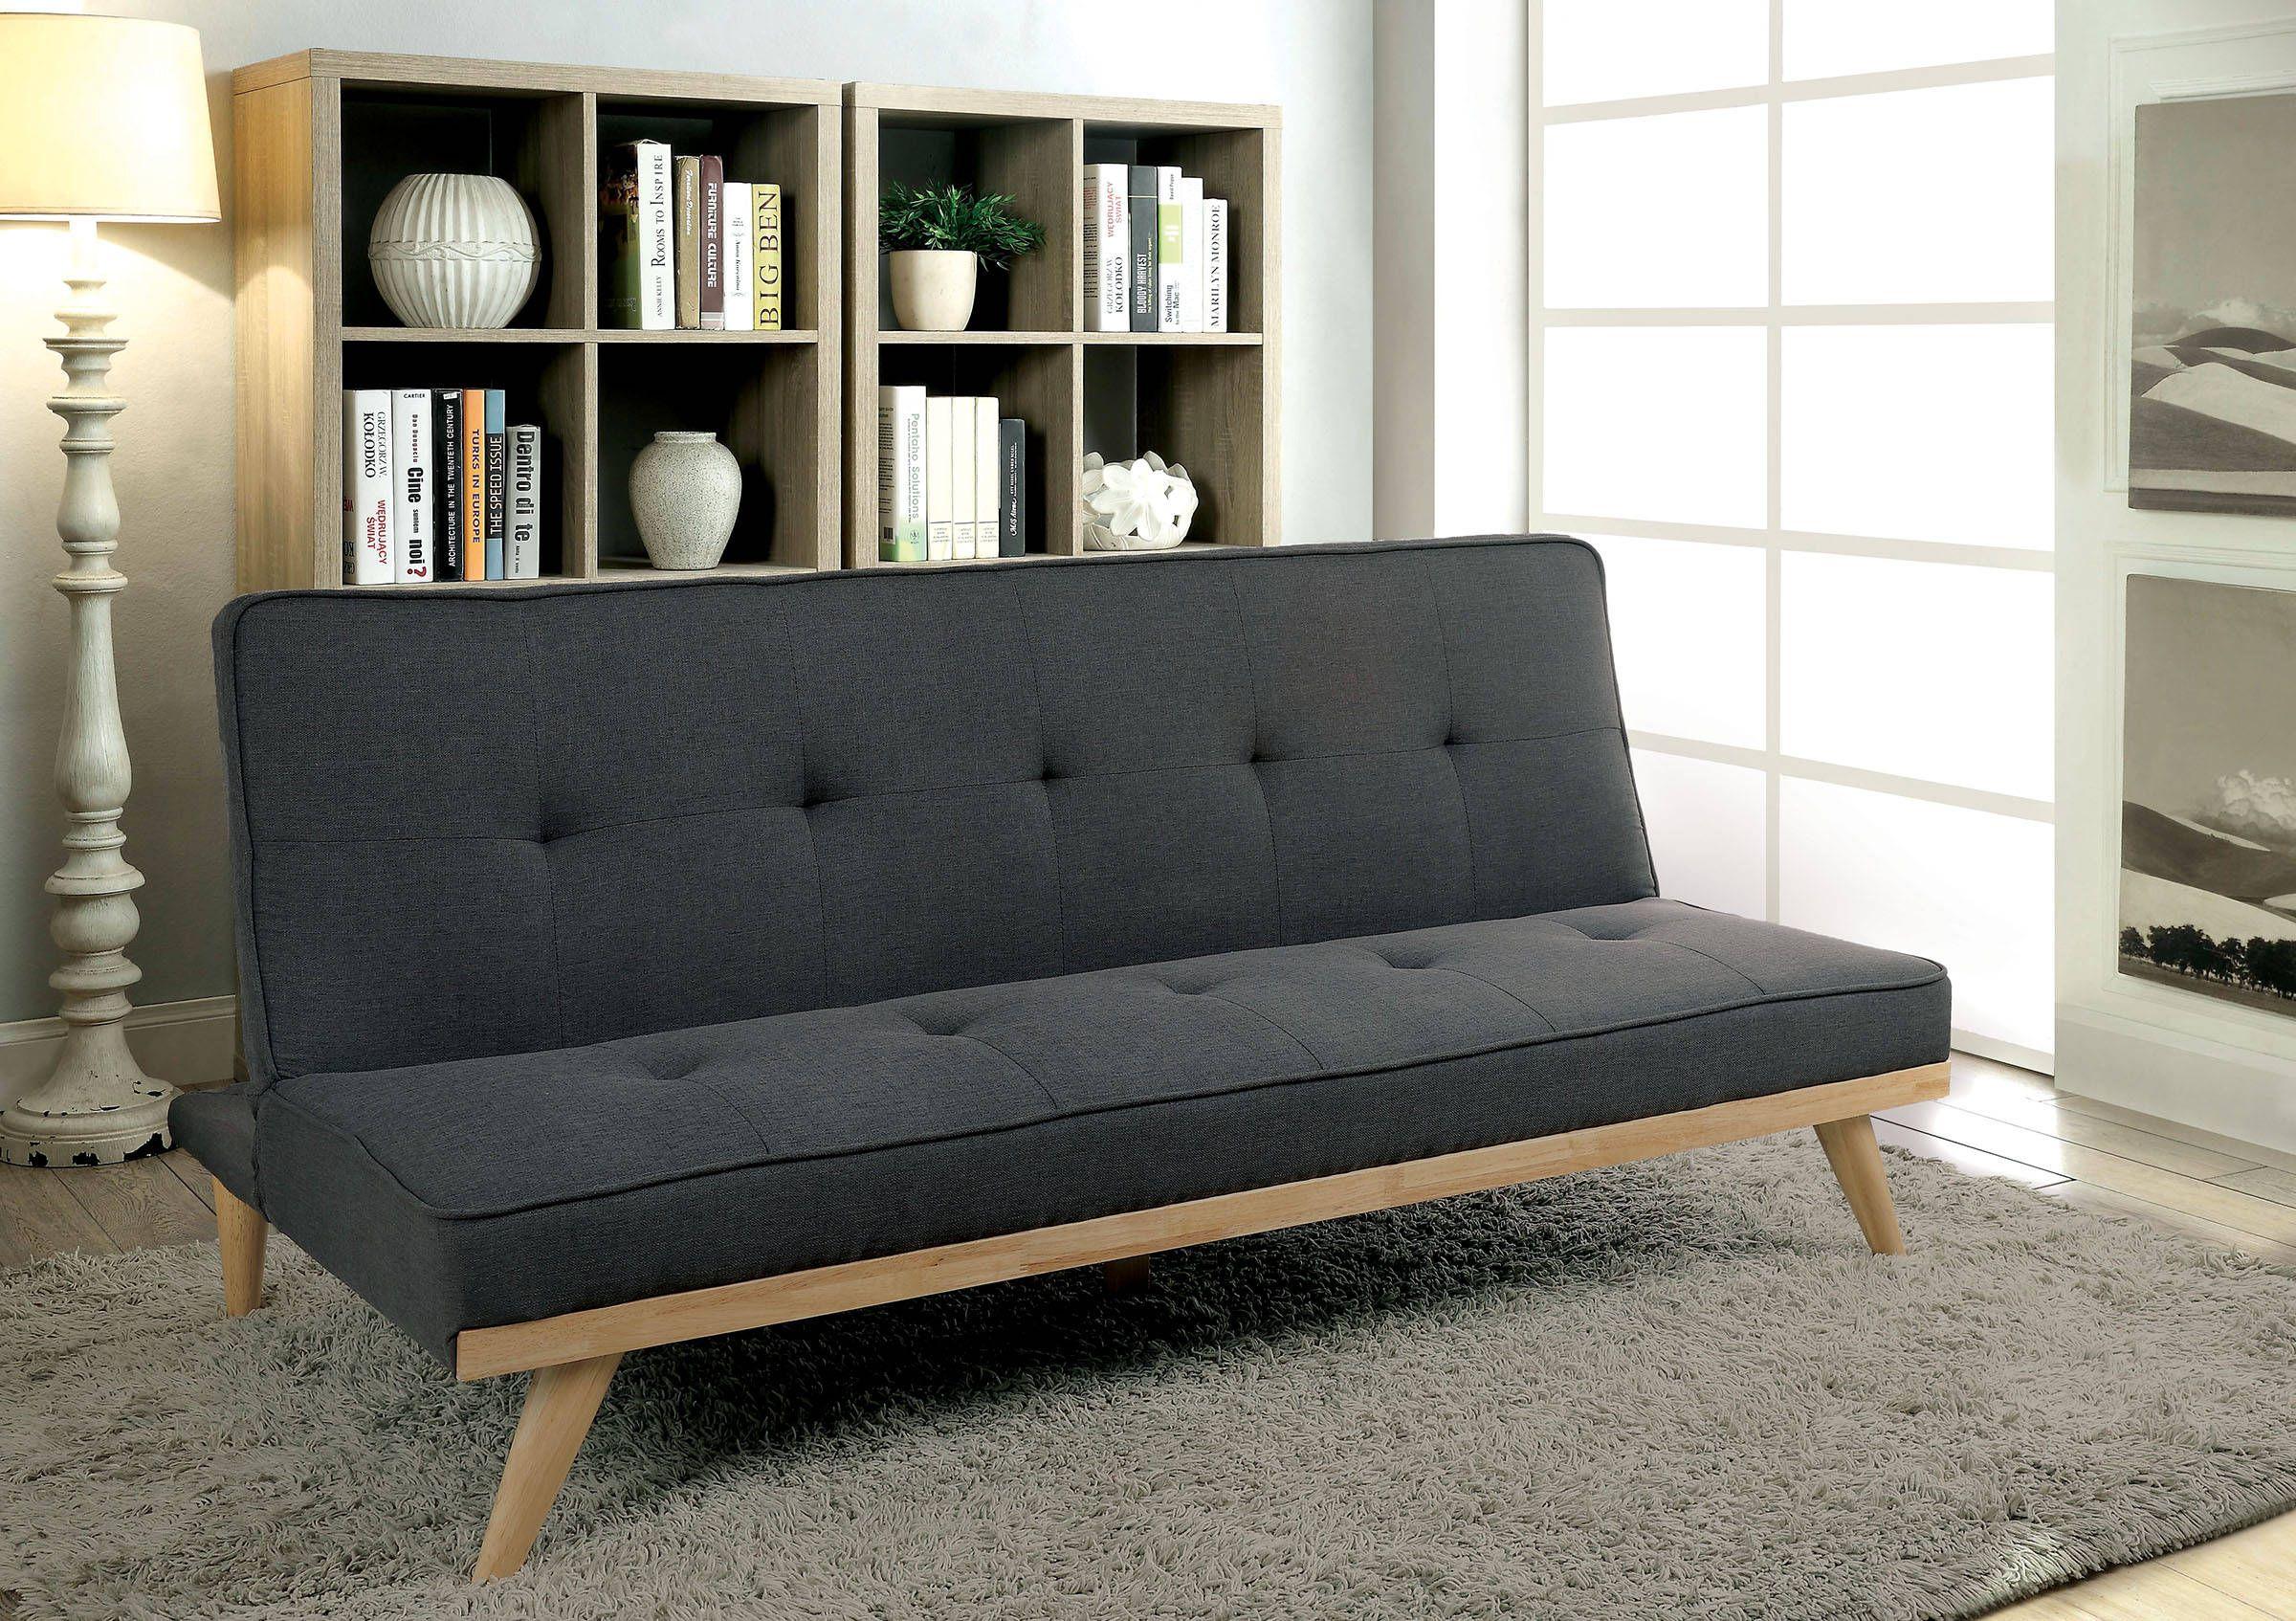 Lyra Contemporary Gray Fabric Futon Sofa   The Classy Home Furniture ...